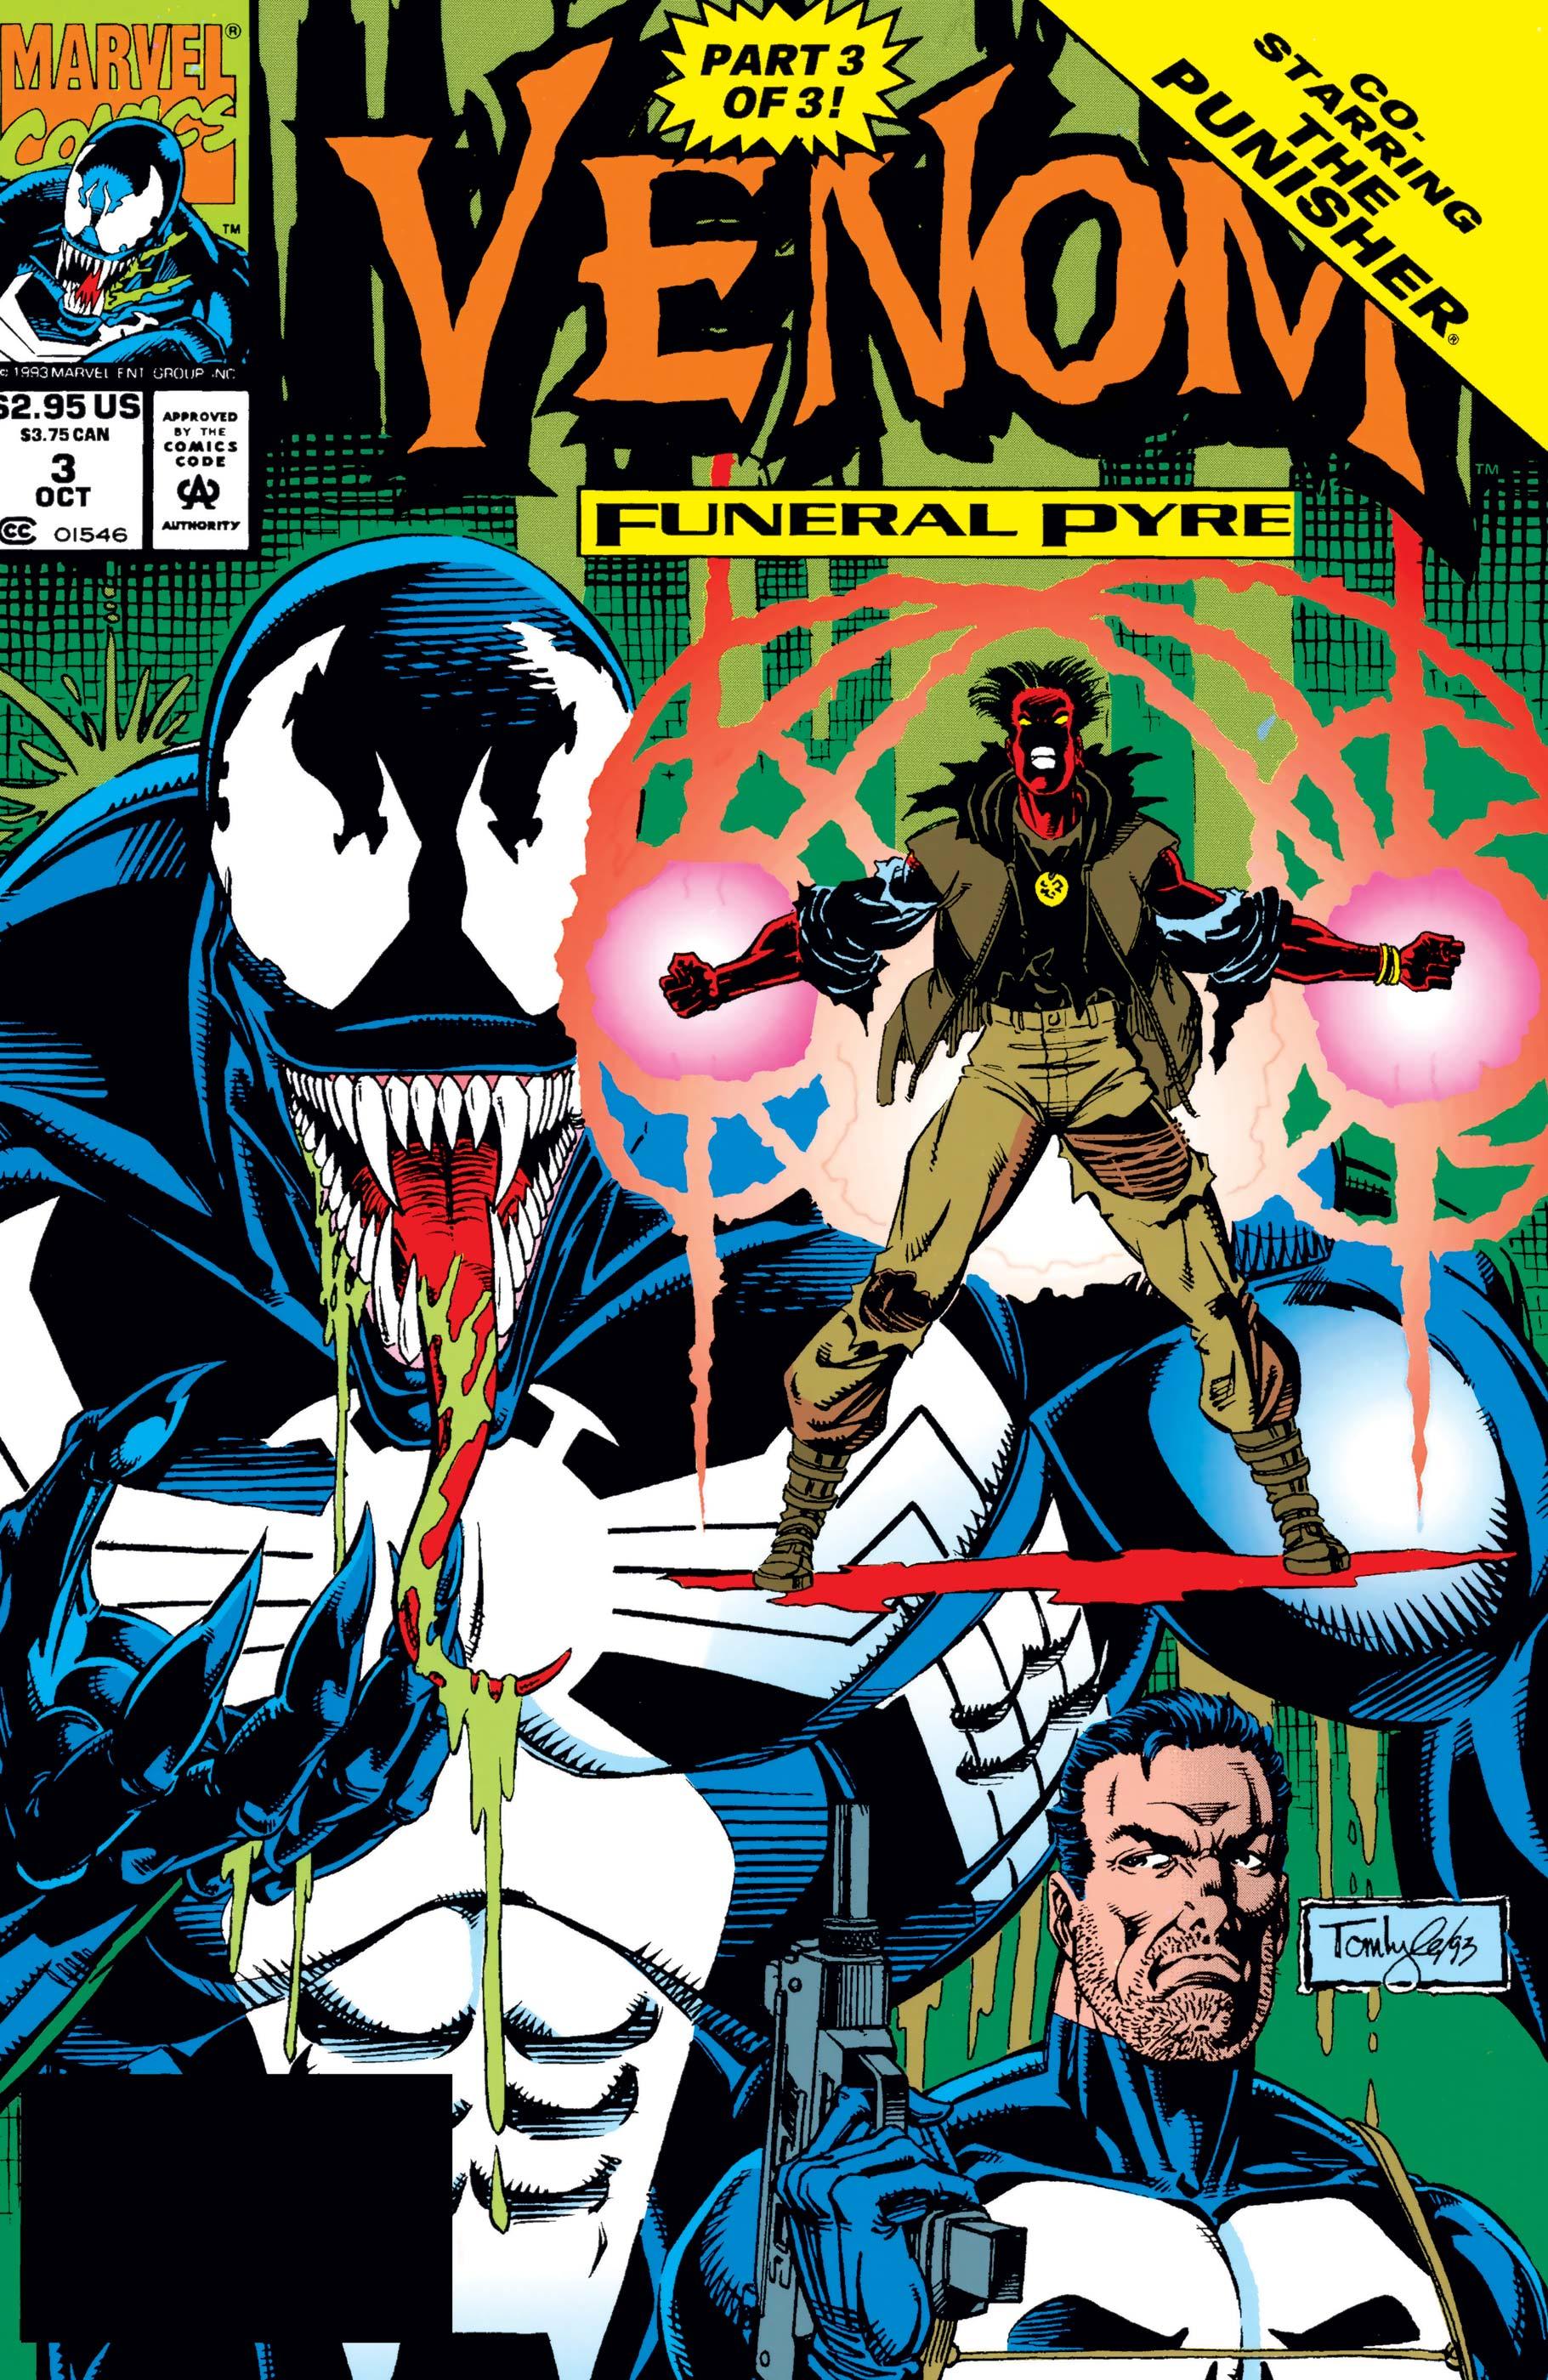 Venom: Funeral Pyre (1993) #3